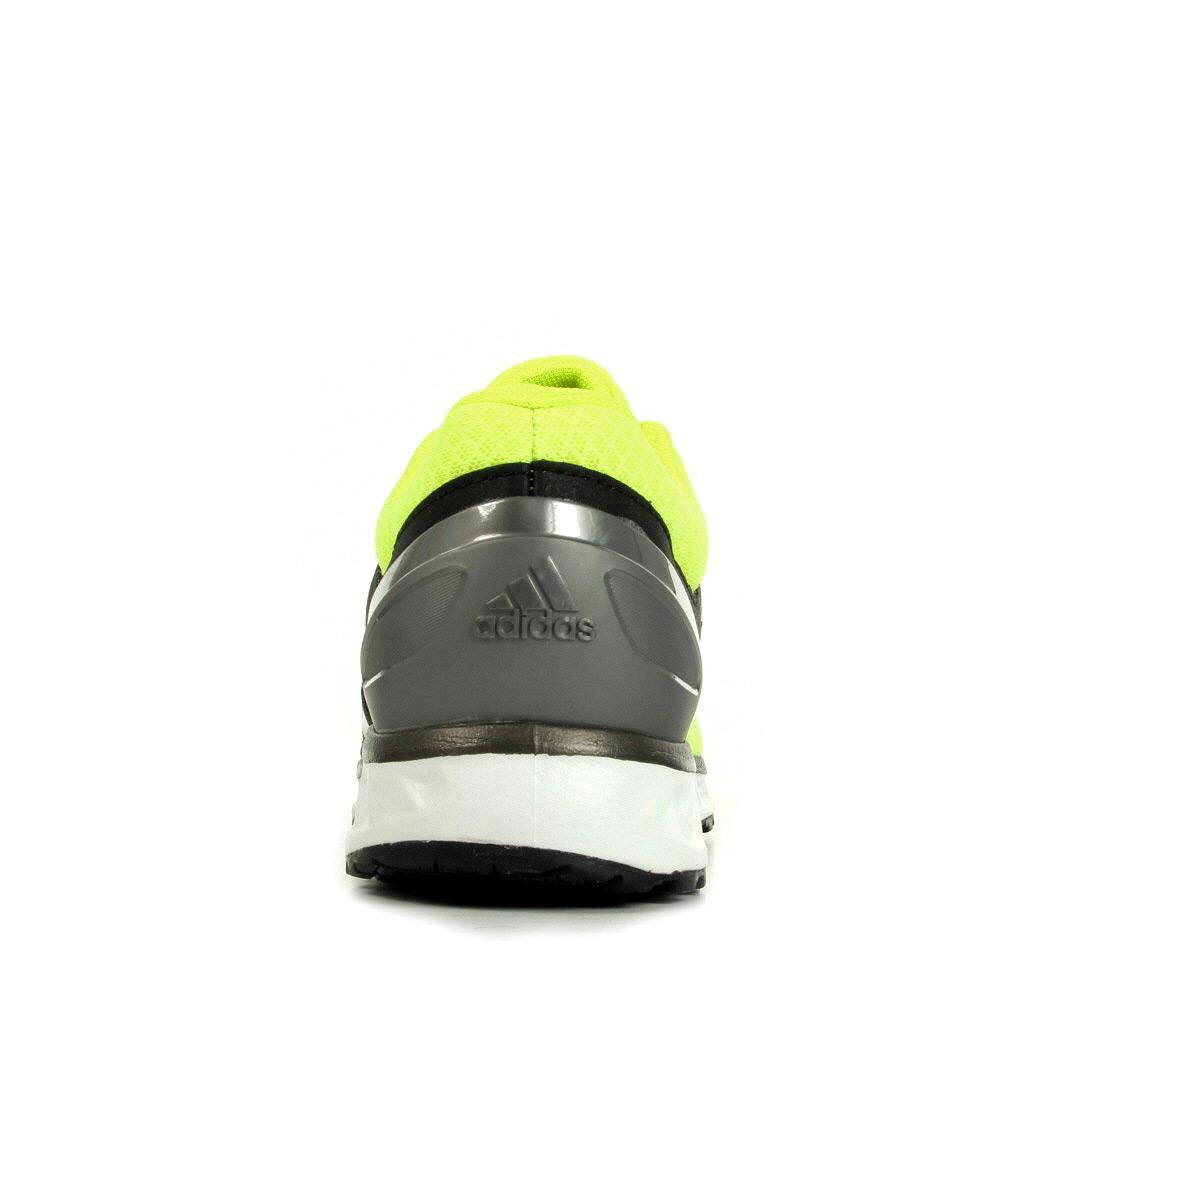 info for d730e b6152 adidas Performance Falcon Elite 3 M Q21477, Chaussures .